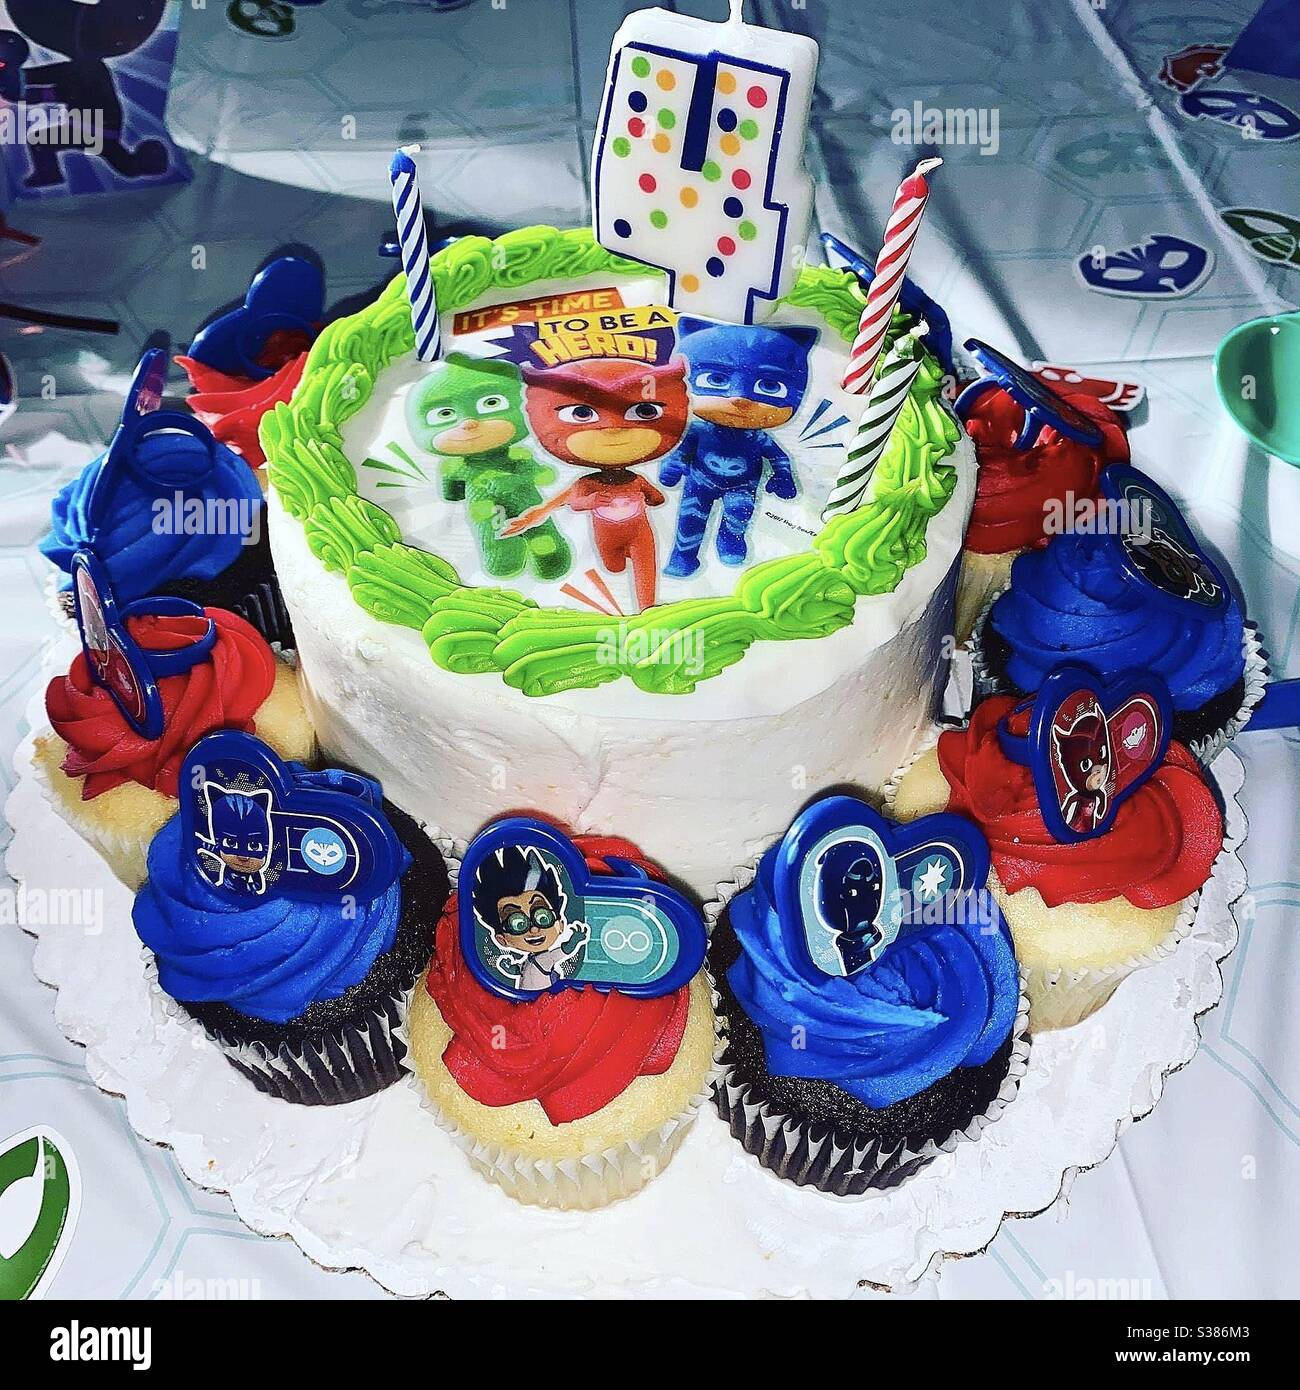 Pj Masks Birthday Cake And Party Stock Photo Alamy